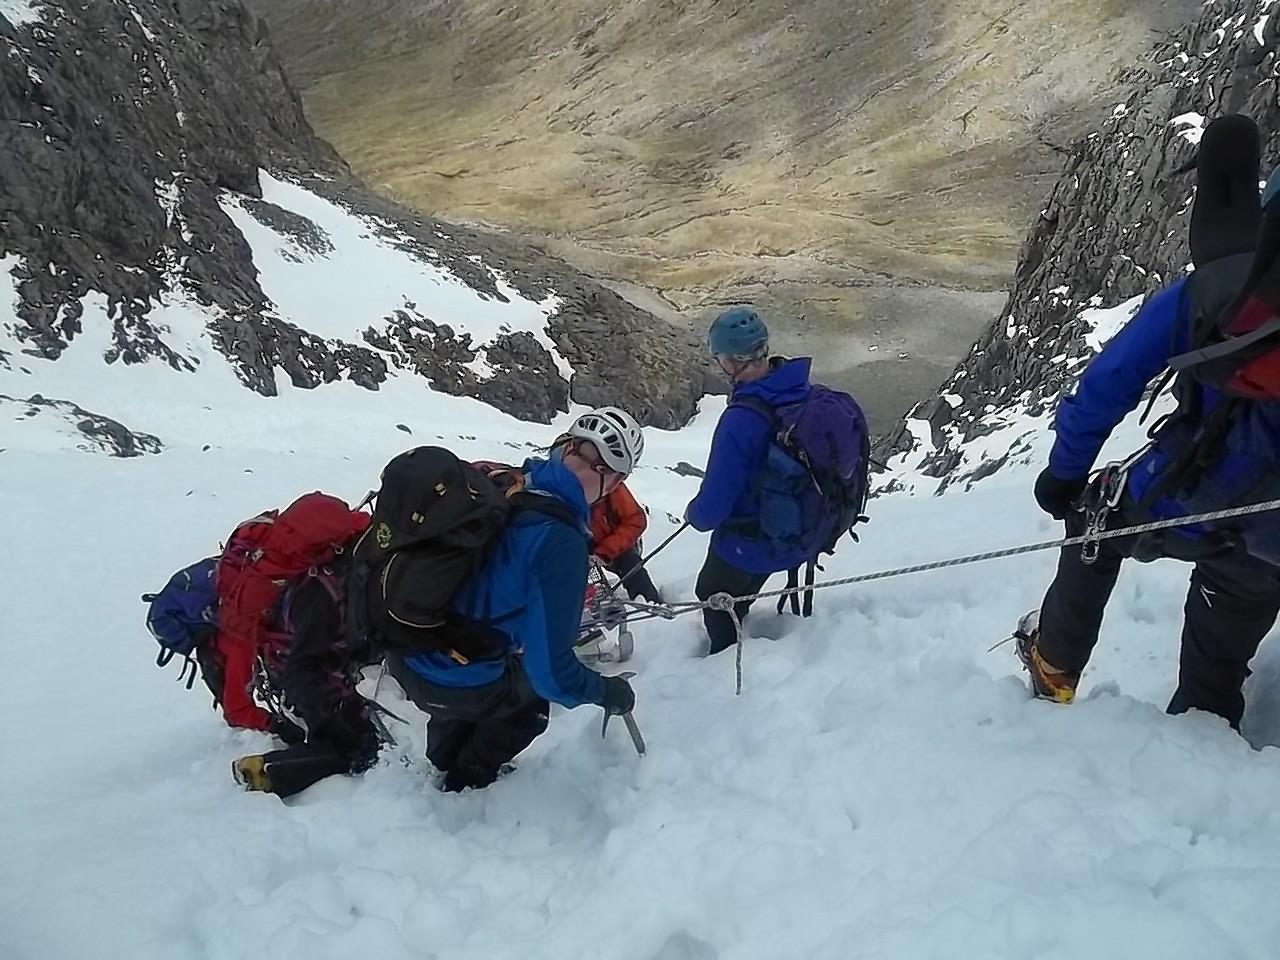 Lochaber Mountain Rescue